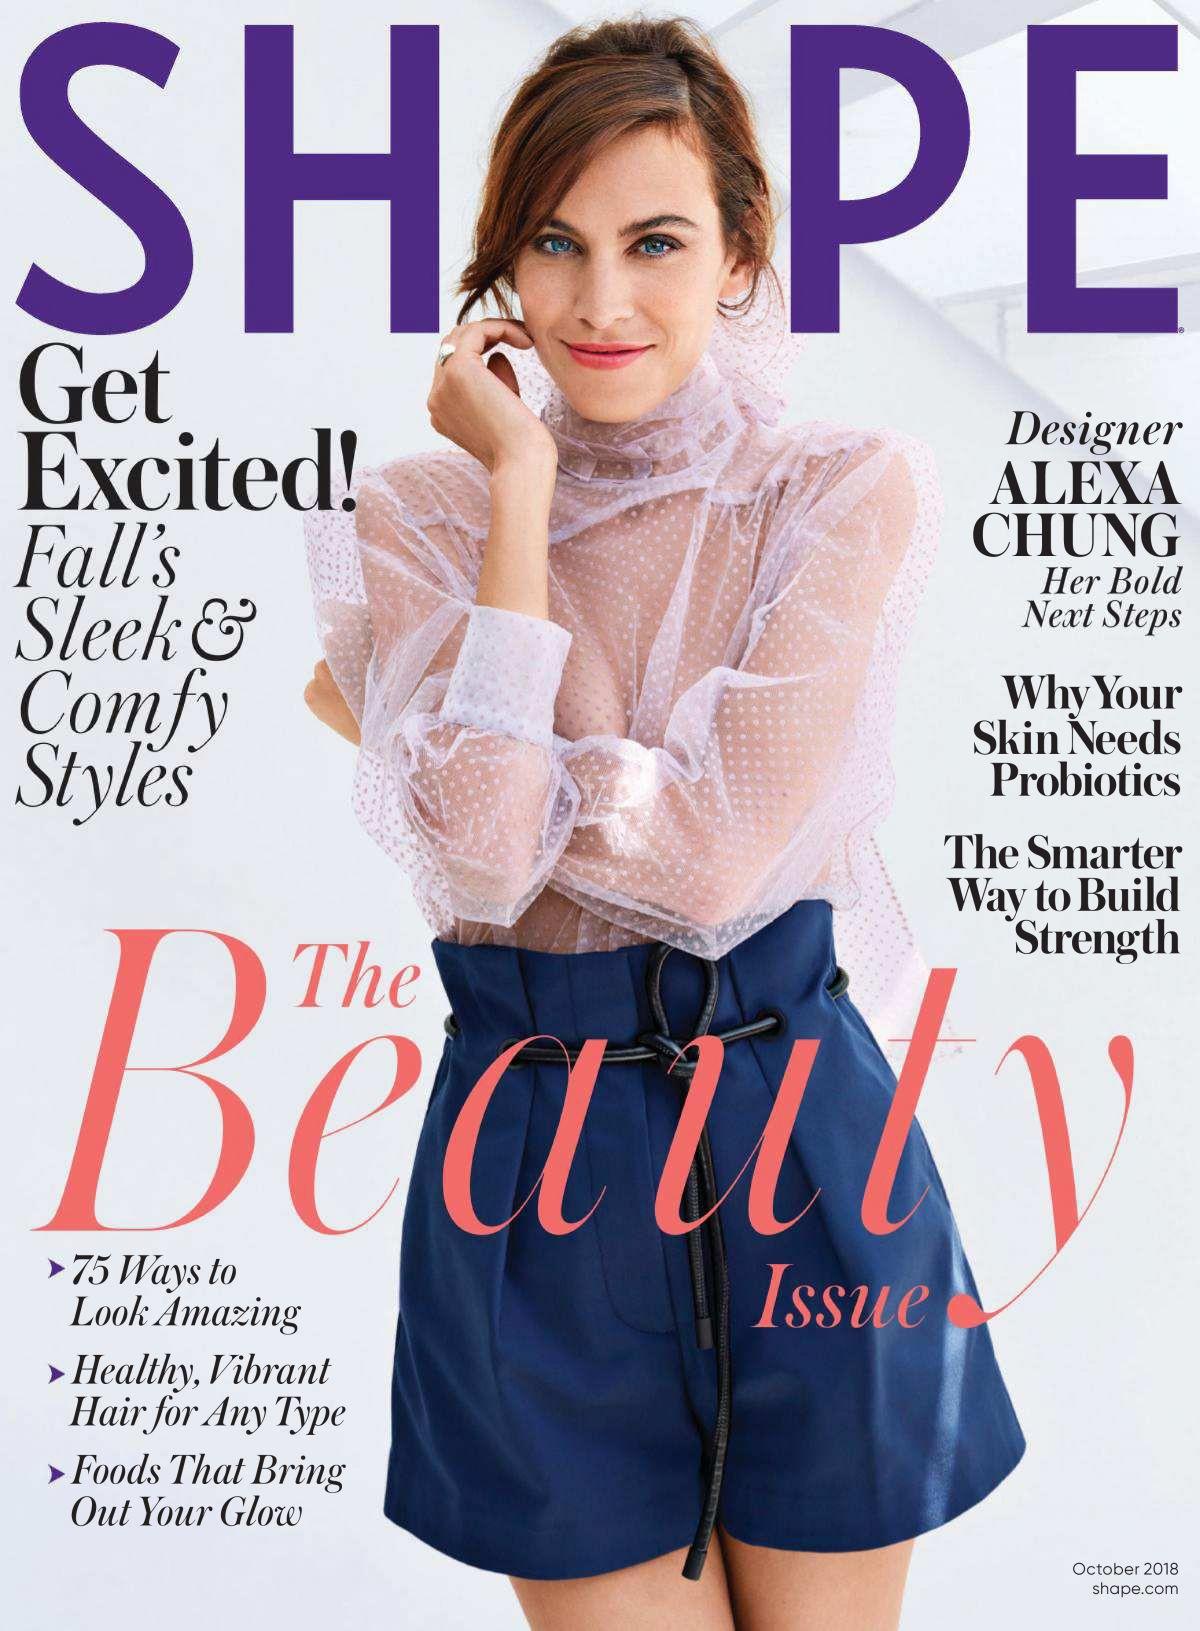 Alexa Chung Shape Magazin, October 2019